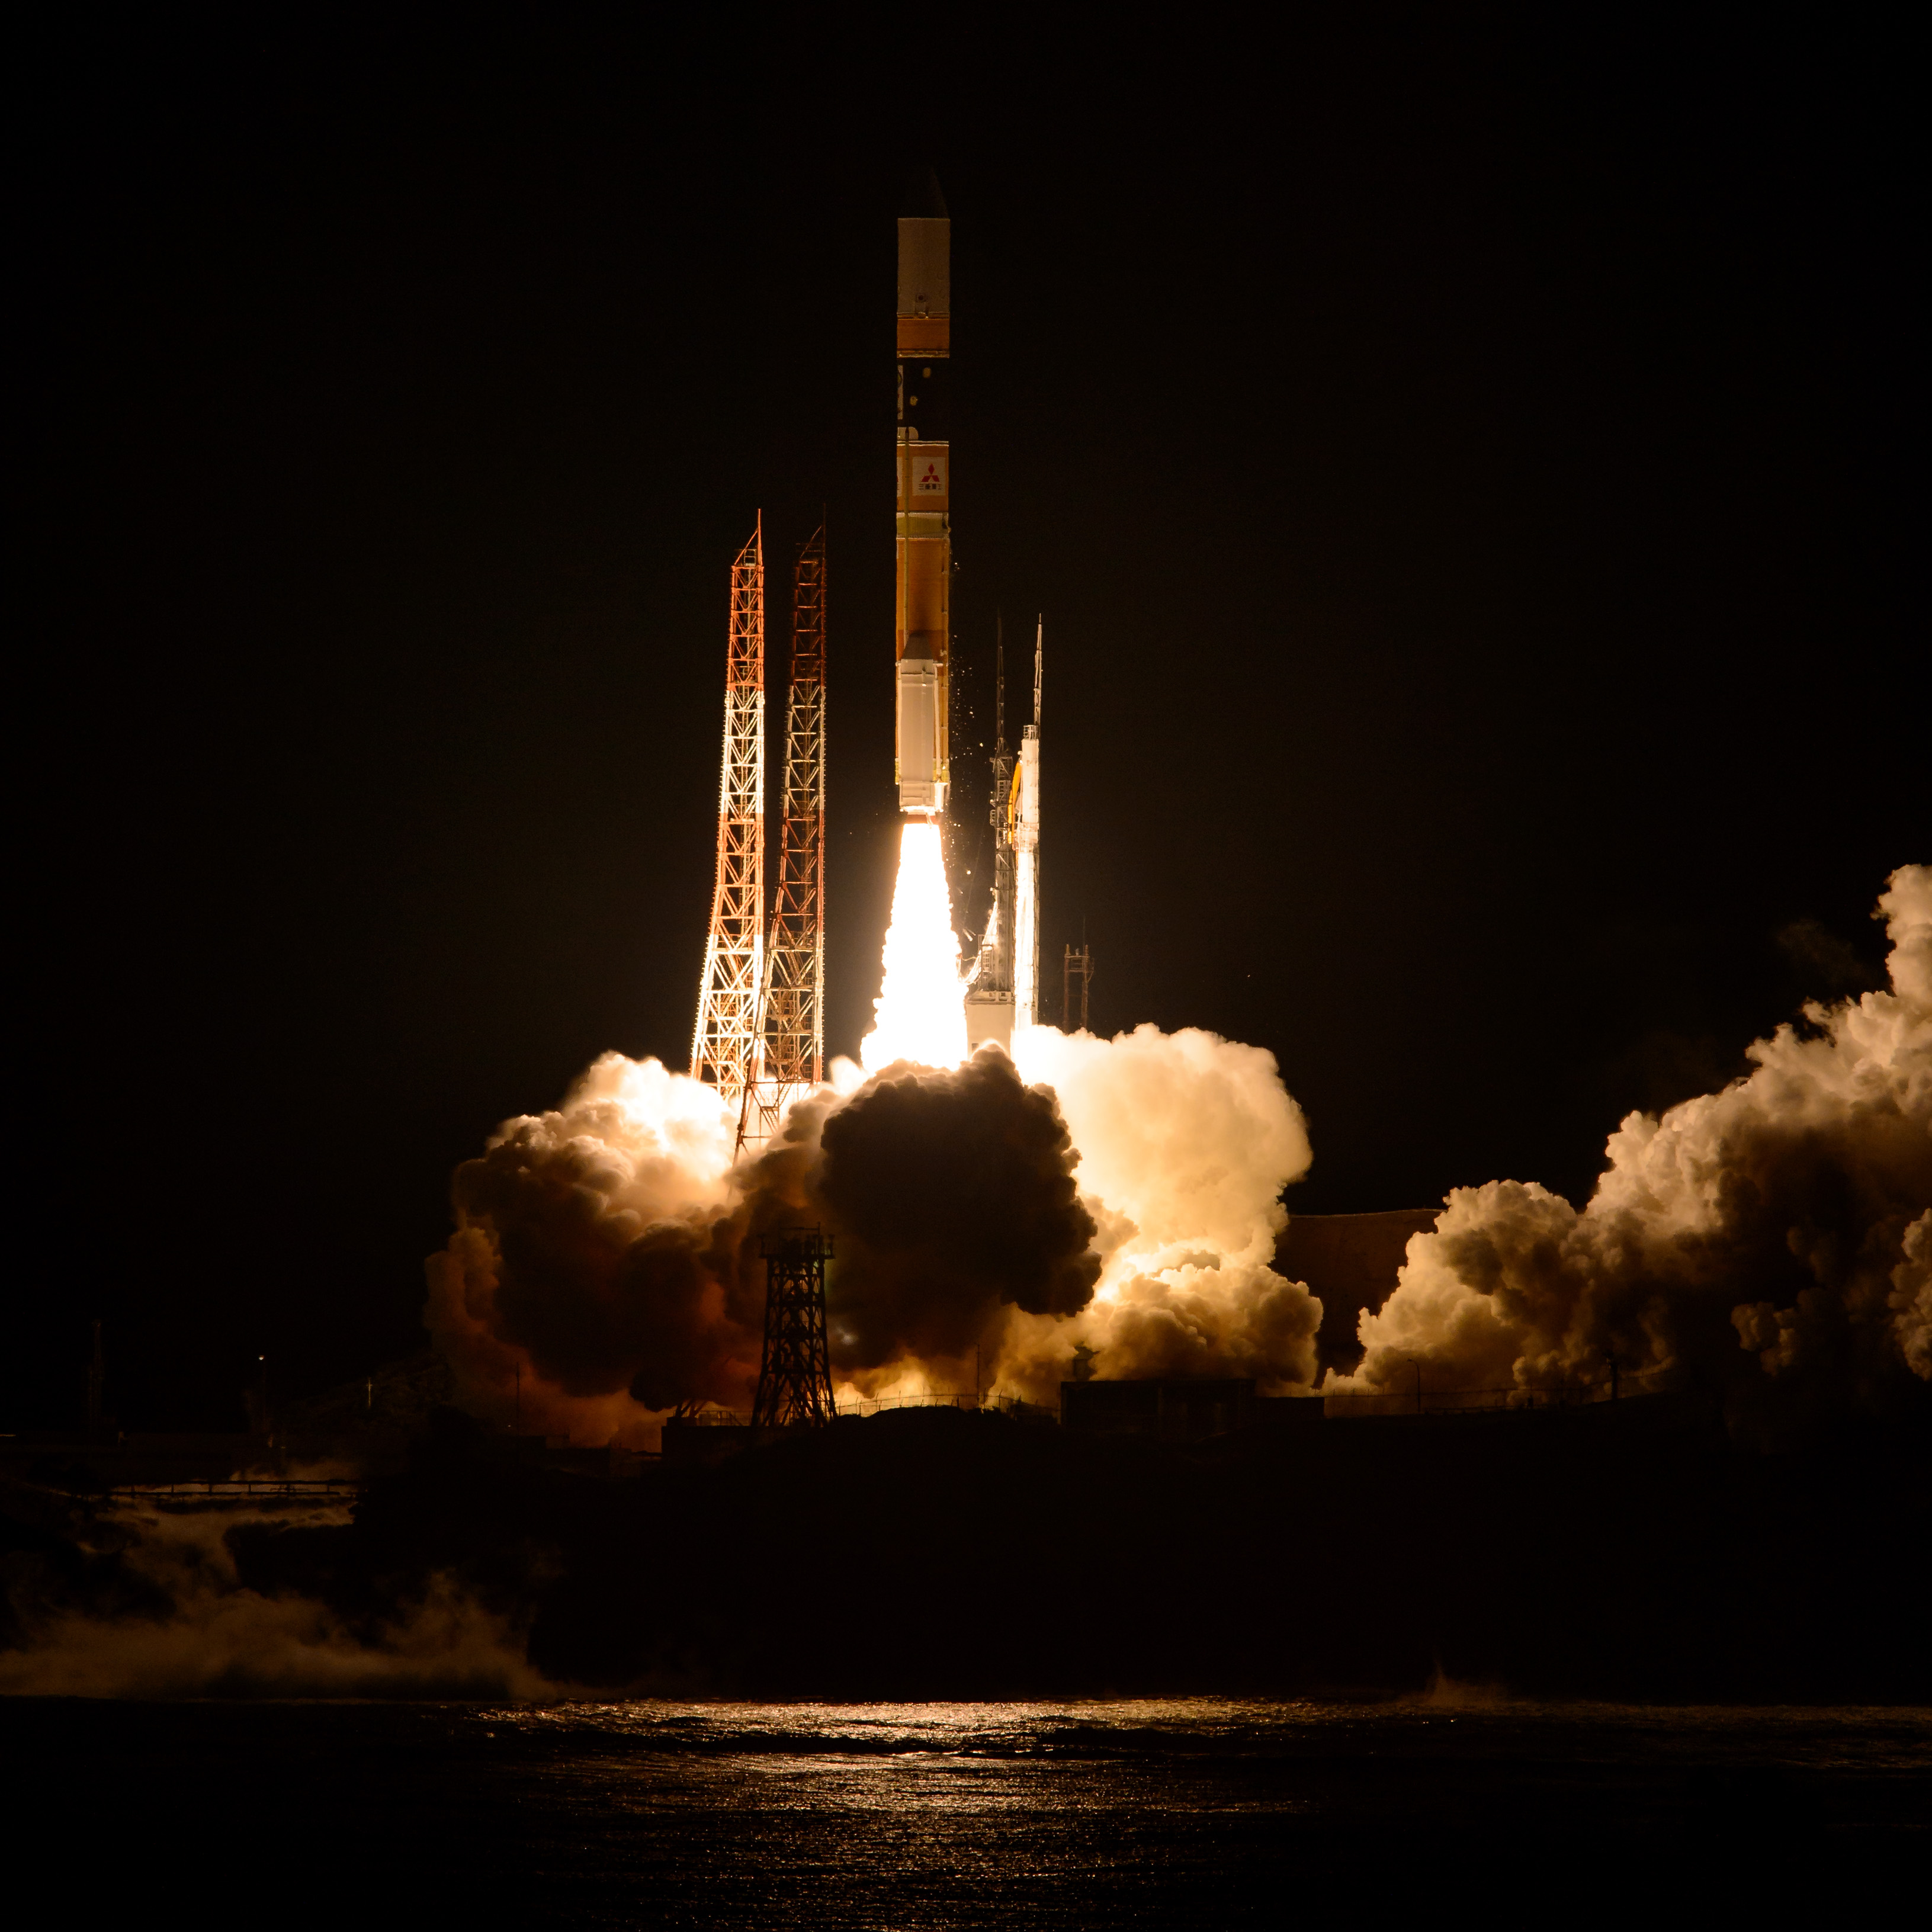 Japan Launches NASA's GPM Satellite